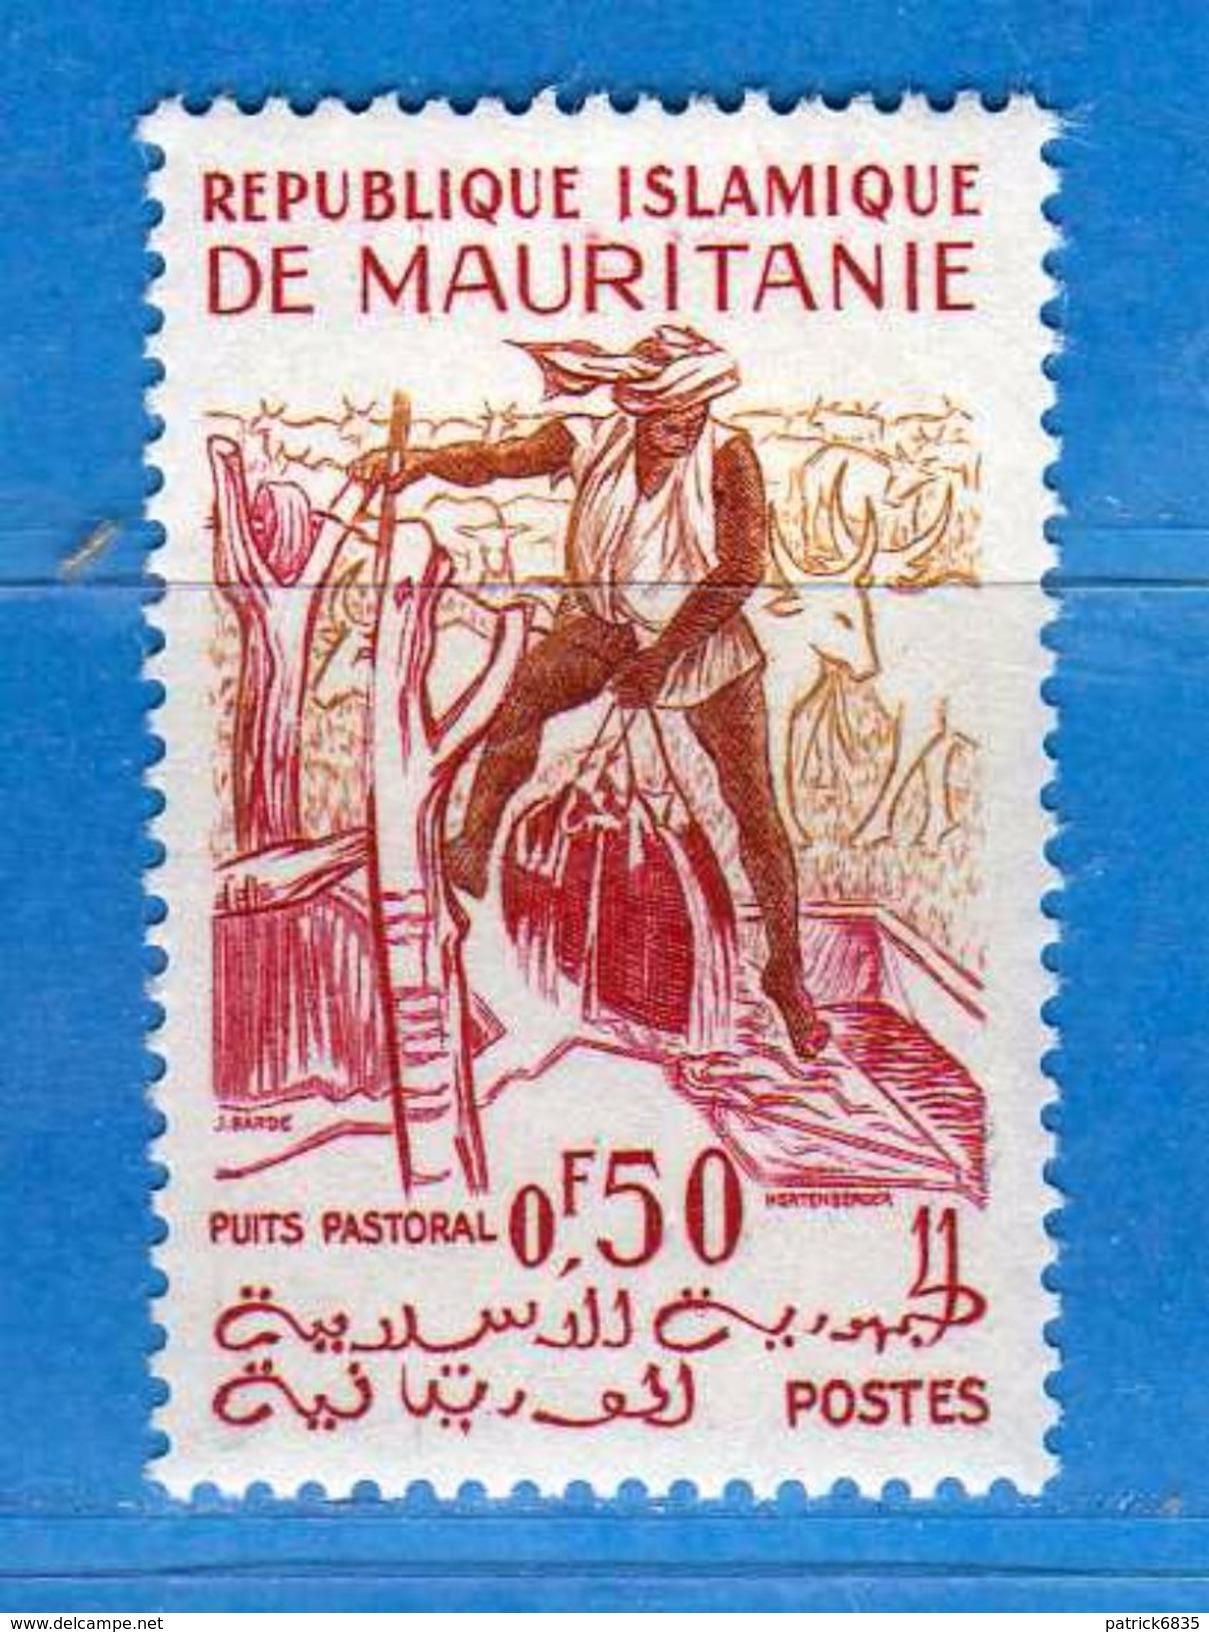 (Mn1) MAURITANIE * - 1960-61 - Activités Tradictionnelles. Yvert. 140 -  MH. .  Vedi Descrizione. - Mauritania (1960-...)